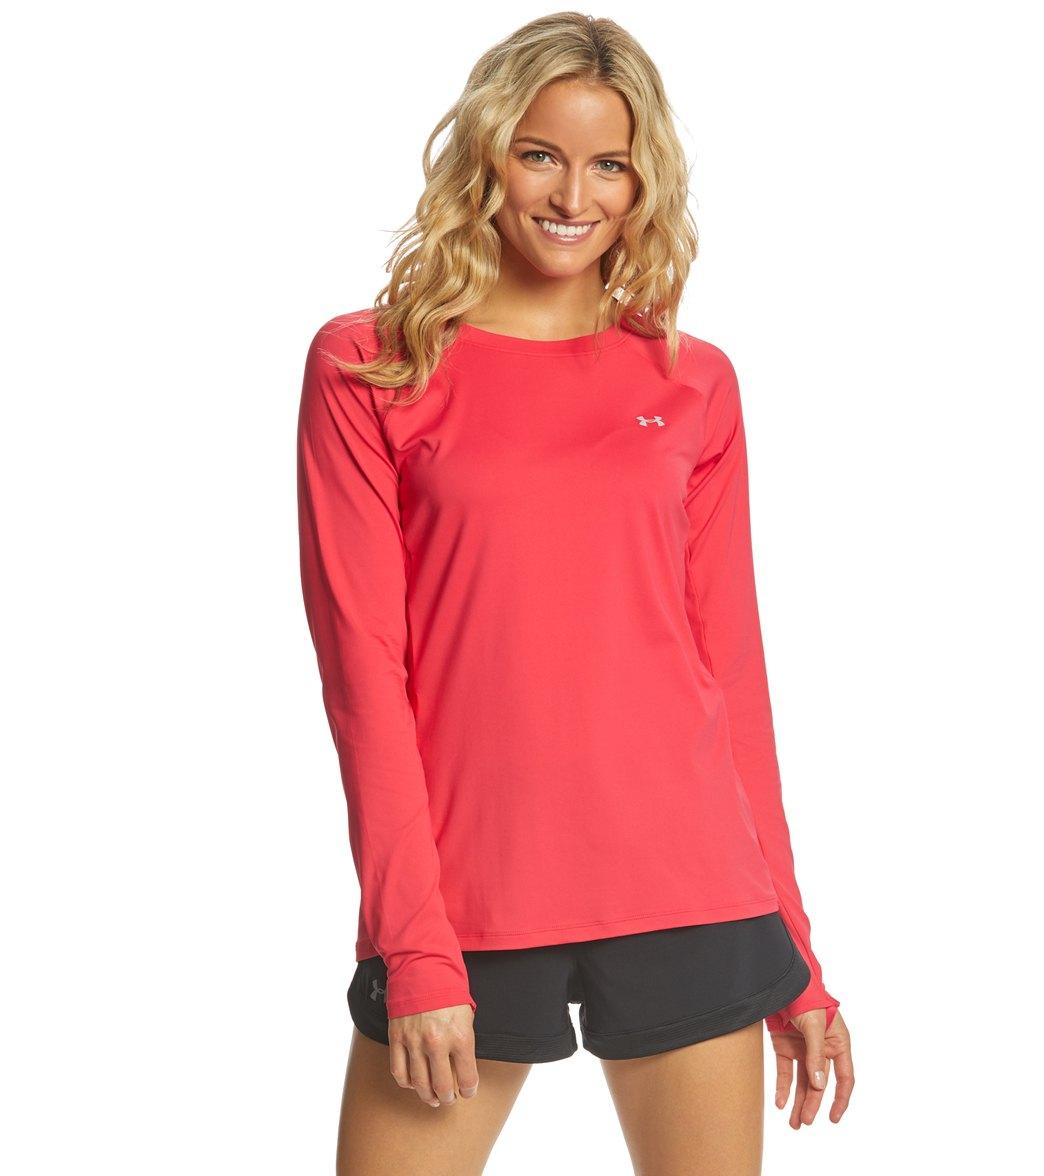 599988688b Under Armour Women's UA Sunblock Long Sleeve Shirt at SwimOutlet.com - Free  Shipping